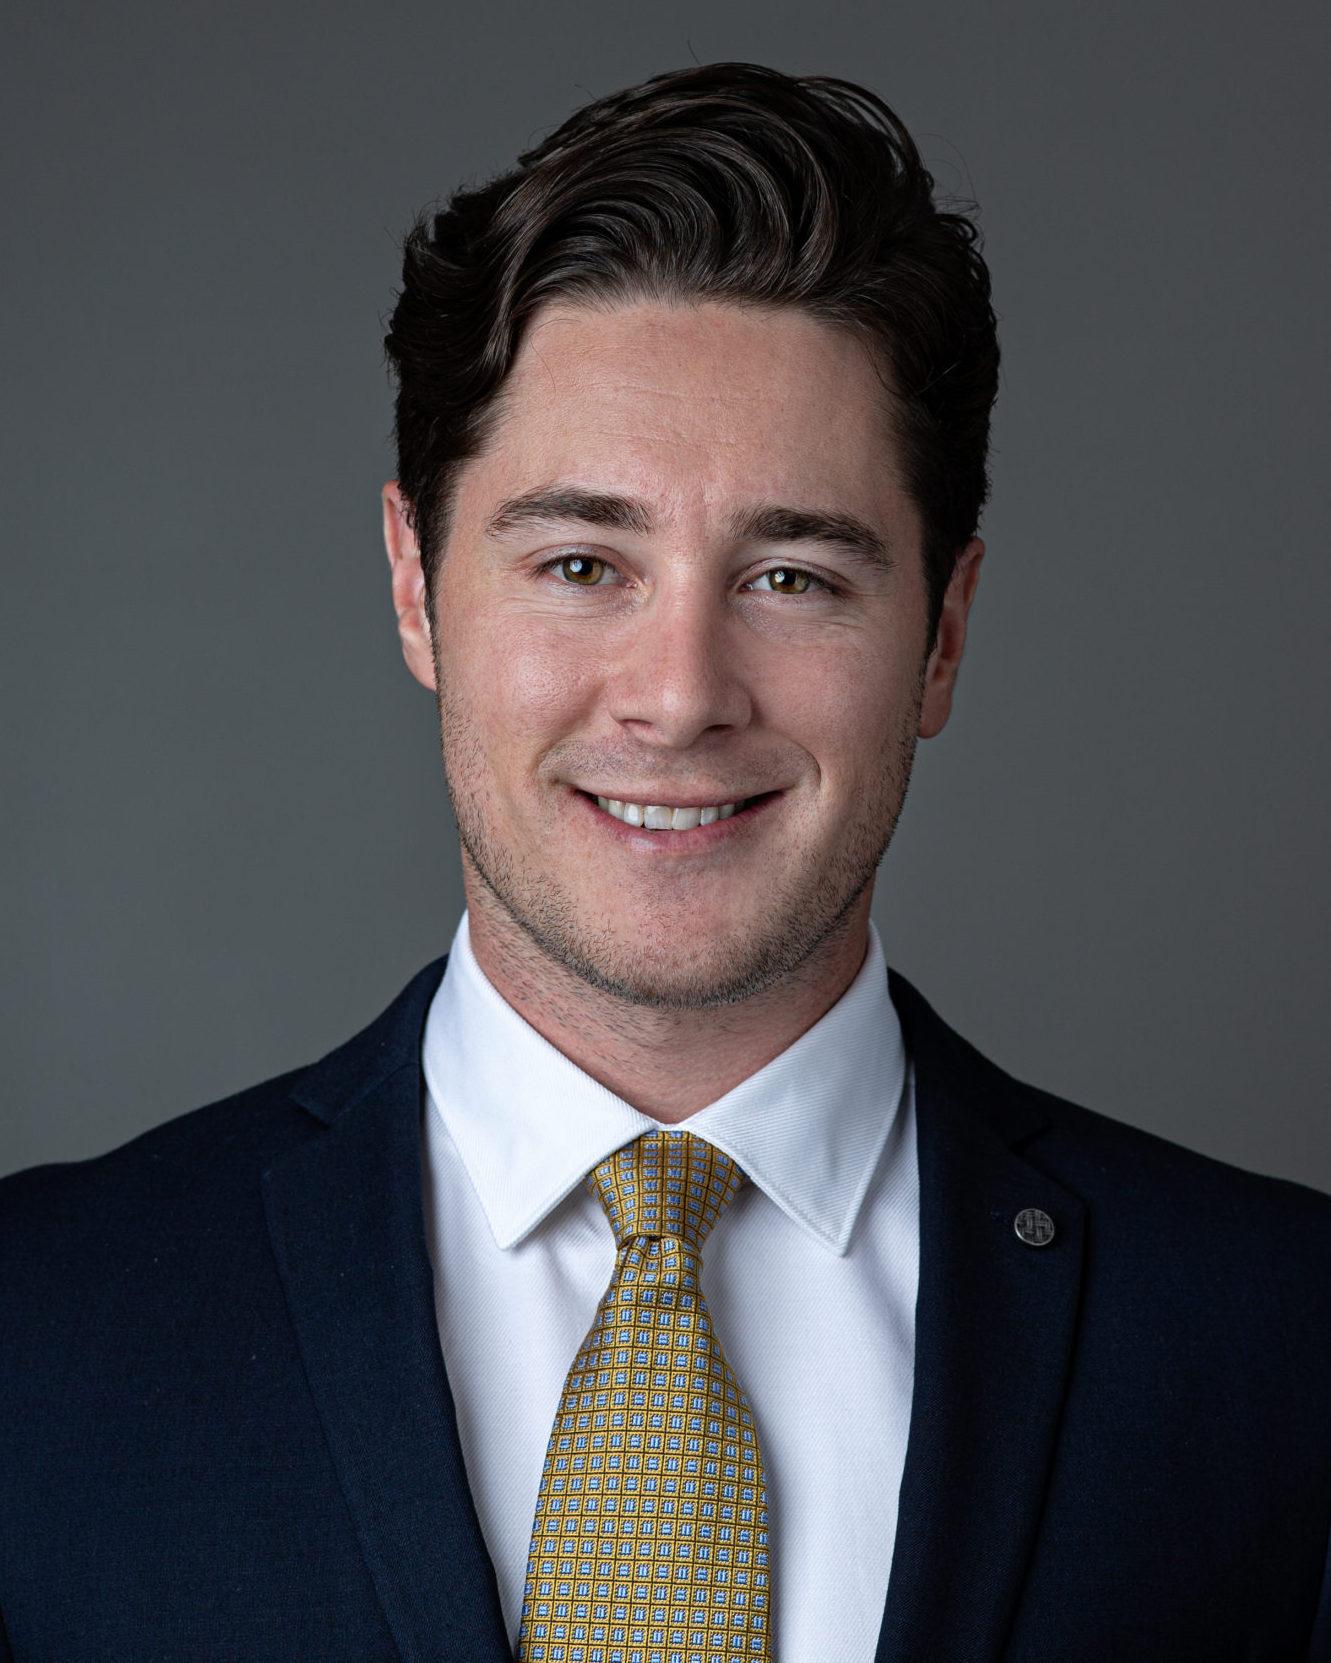 Tyler Maslakewycz headshot